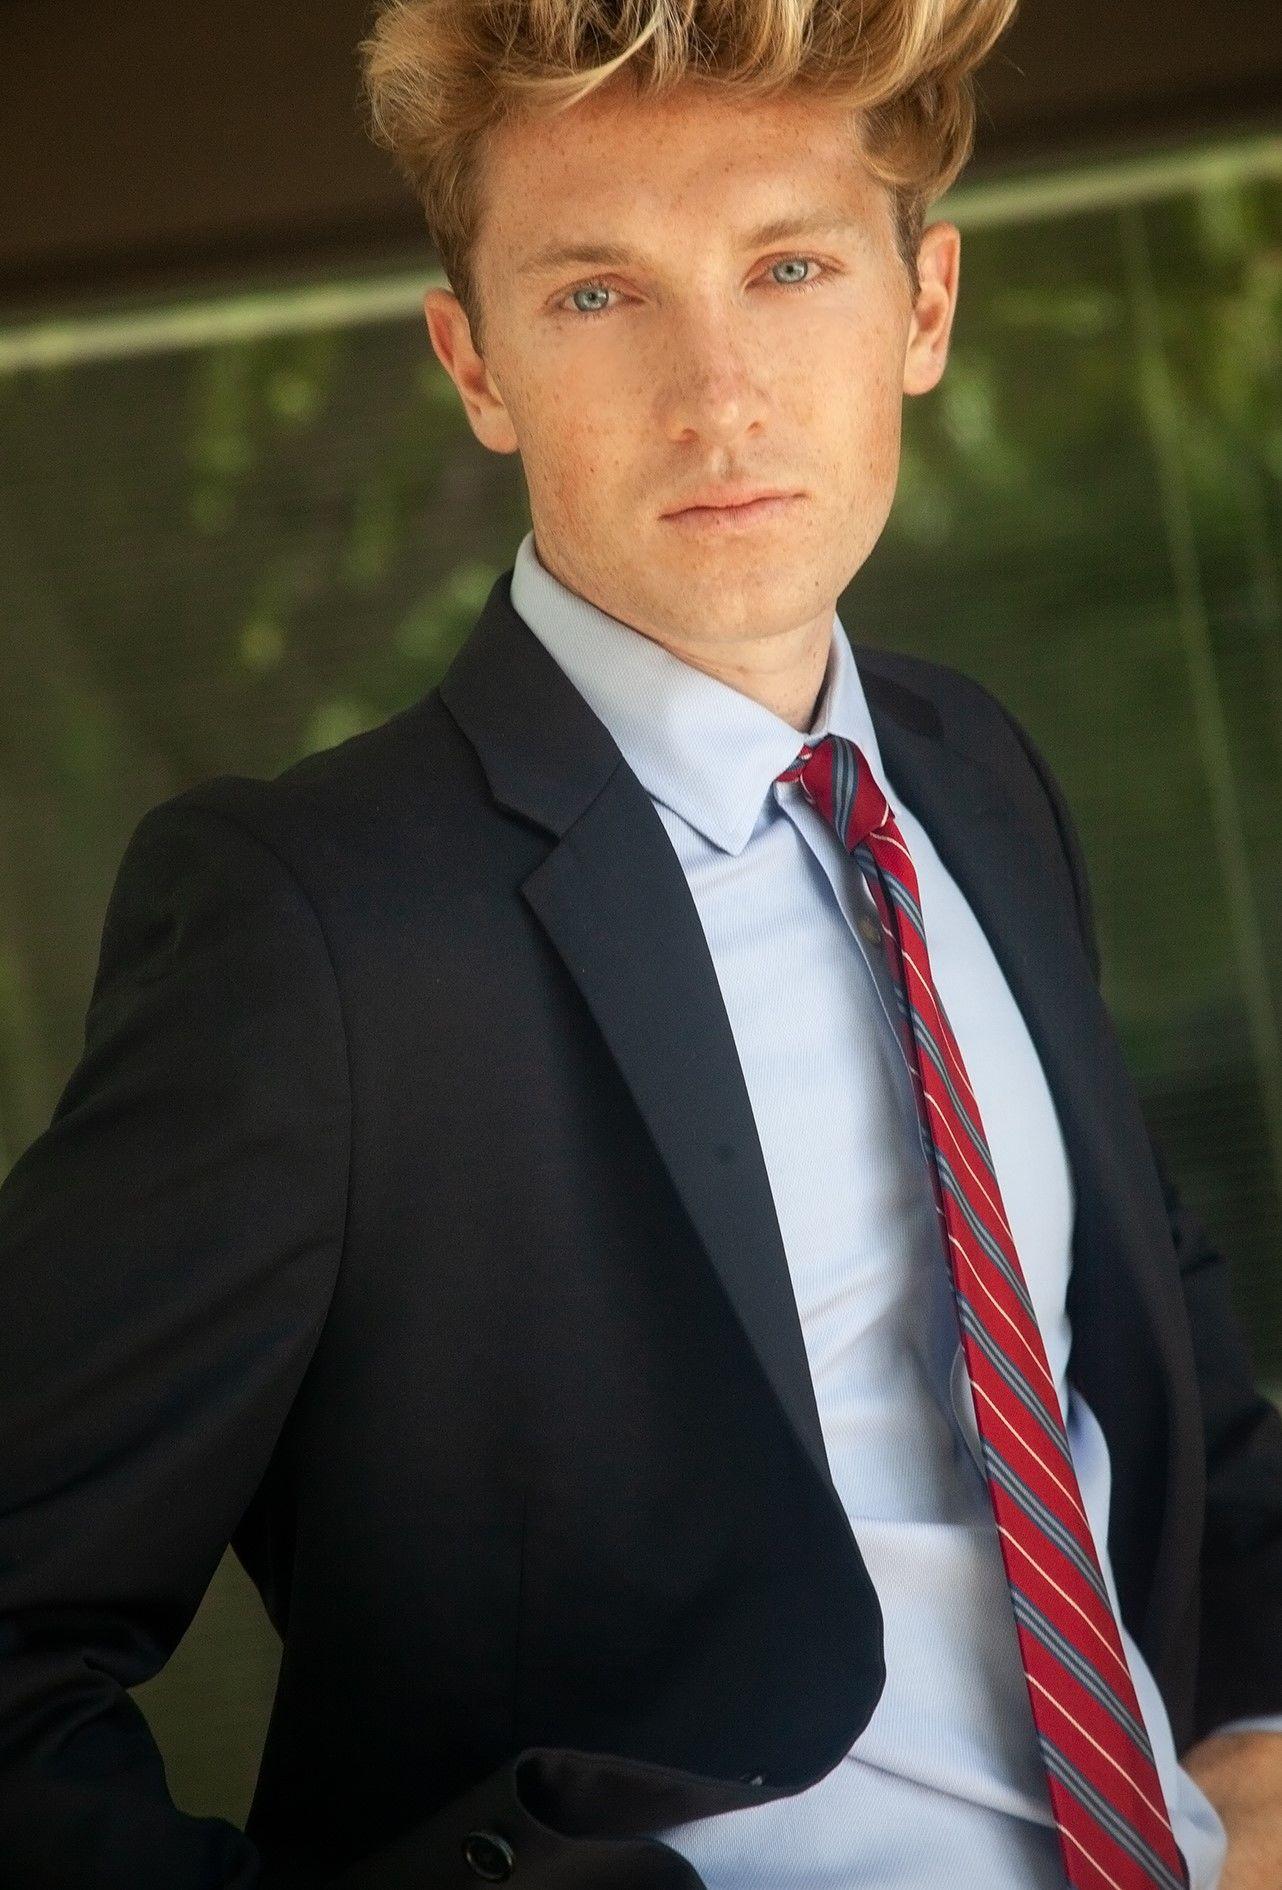 Will Spencer